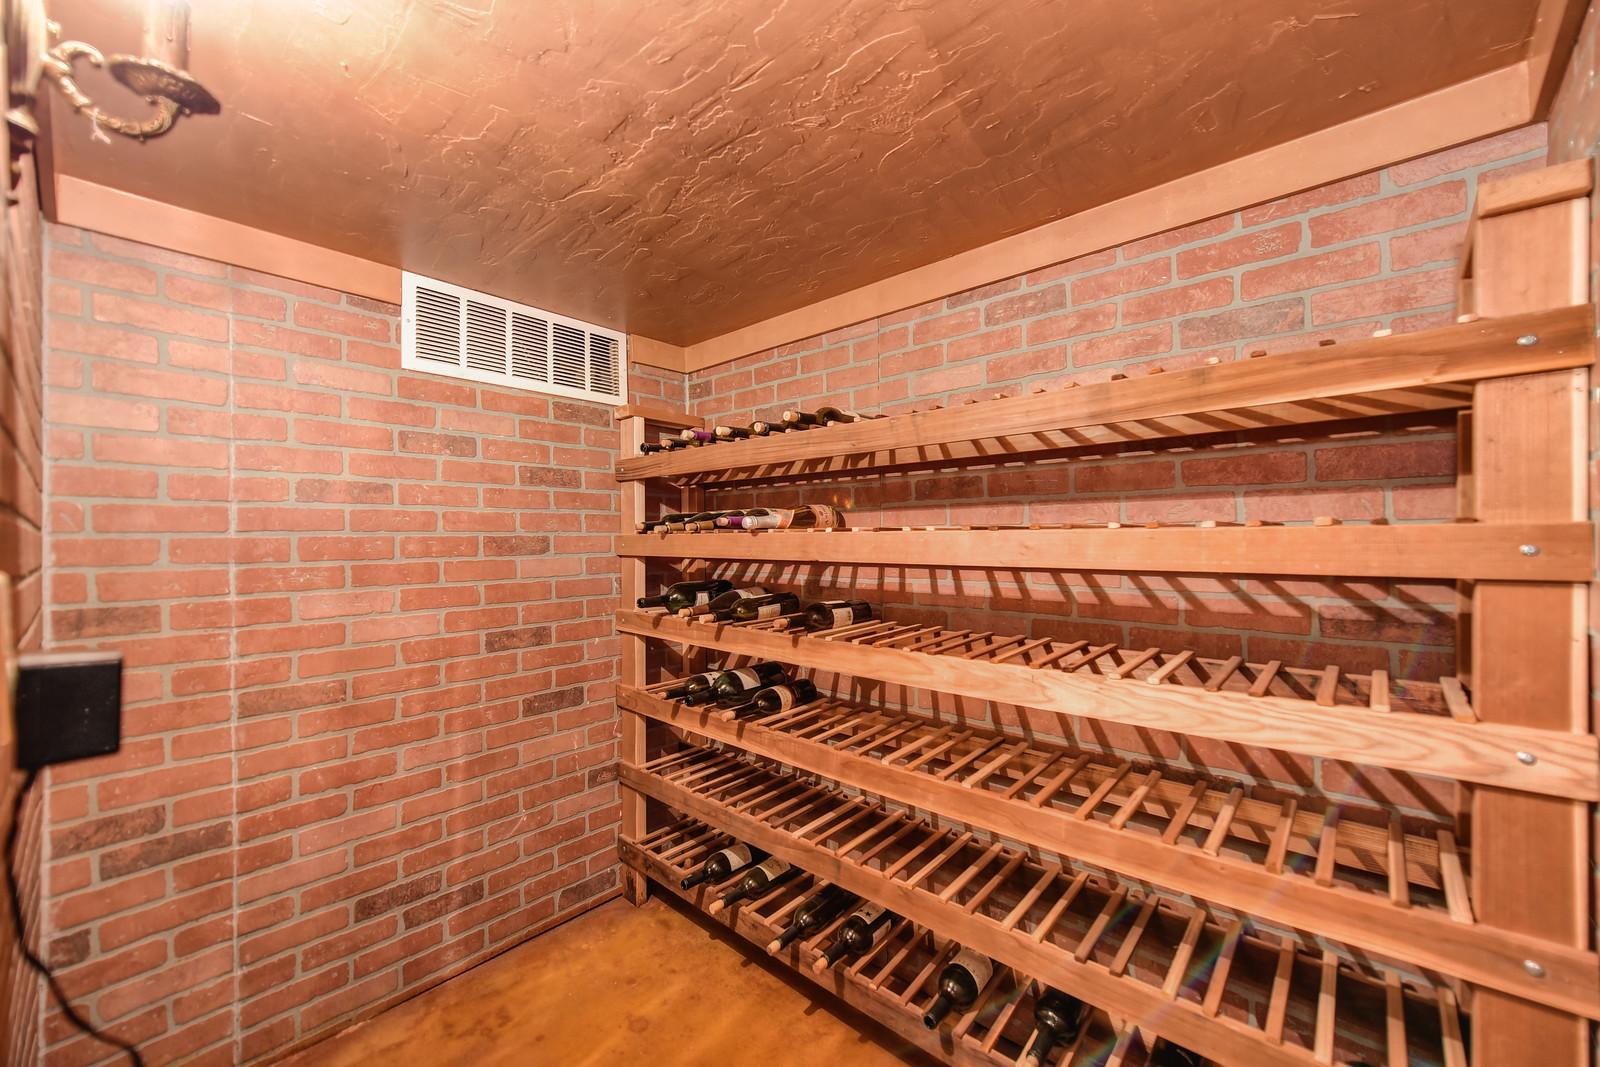 Sherri-Patterson-Team-Keller-Williams-Folsom-Just-Listed-wine-cellar.jpg